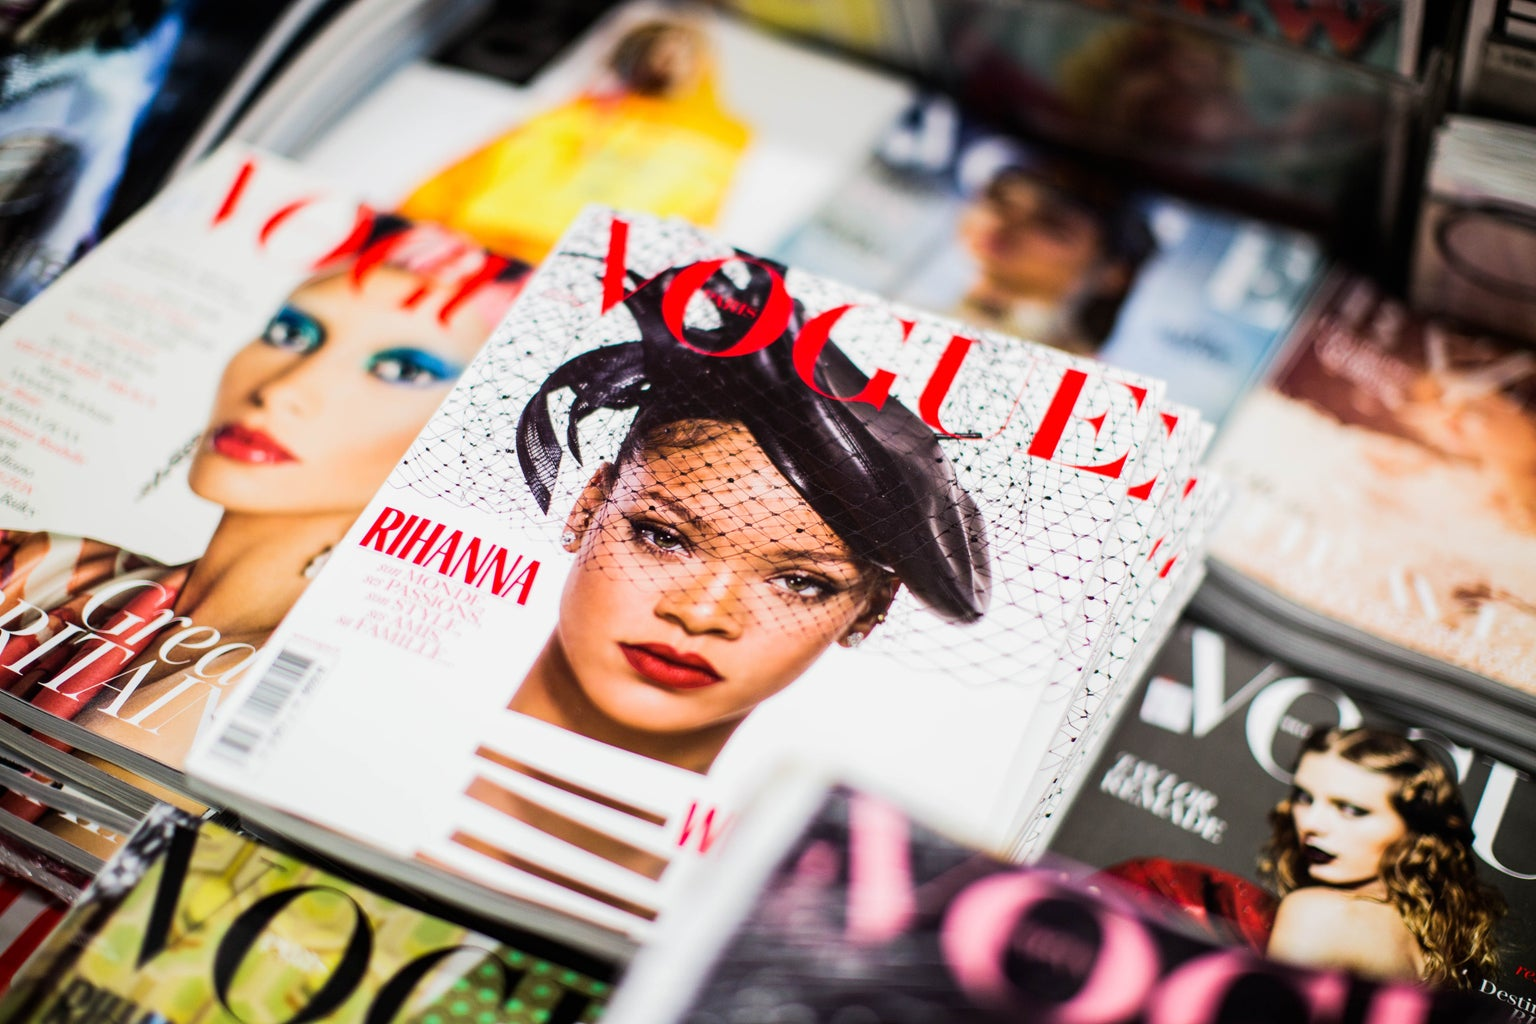 Rihanna on Vogue magazine